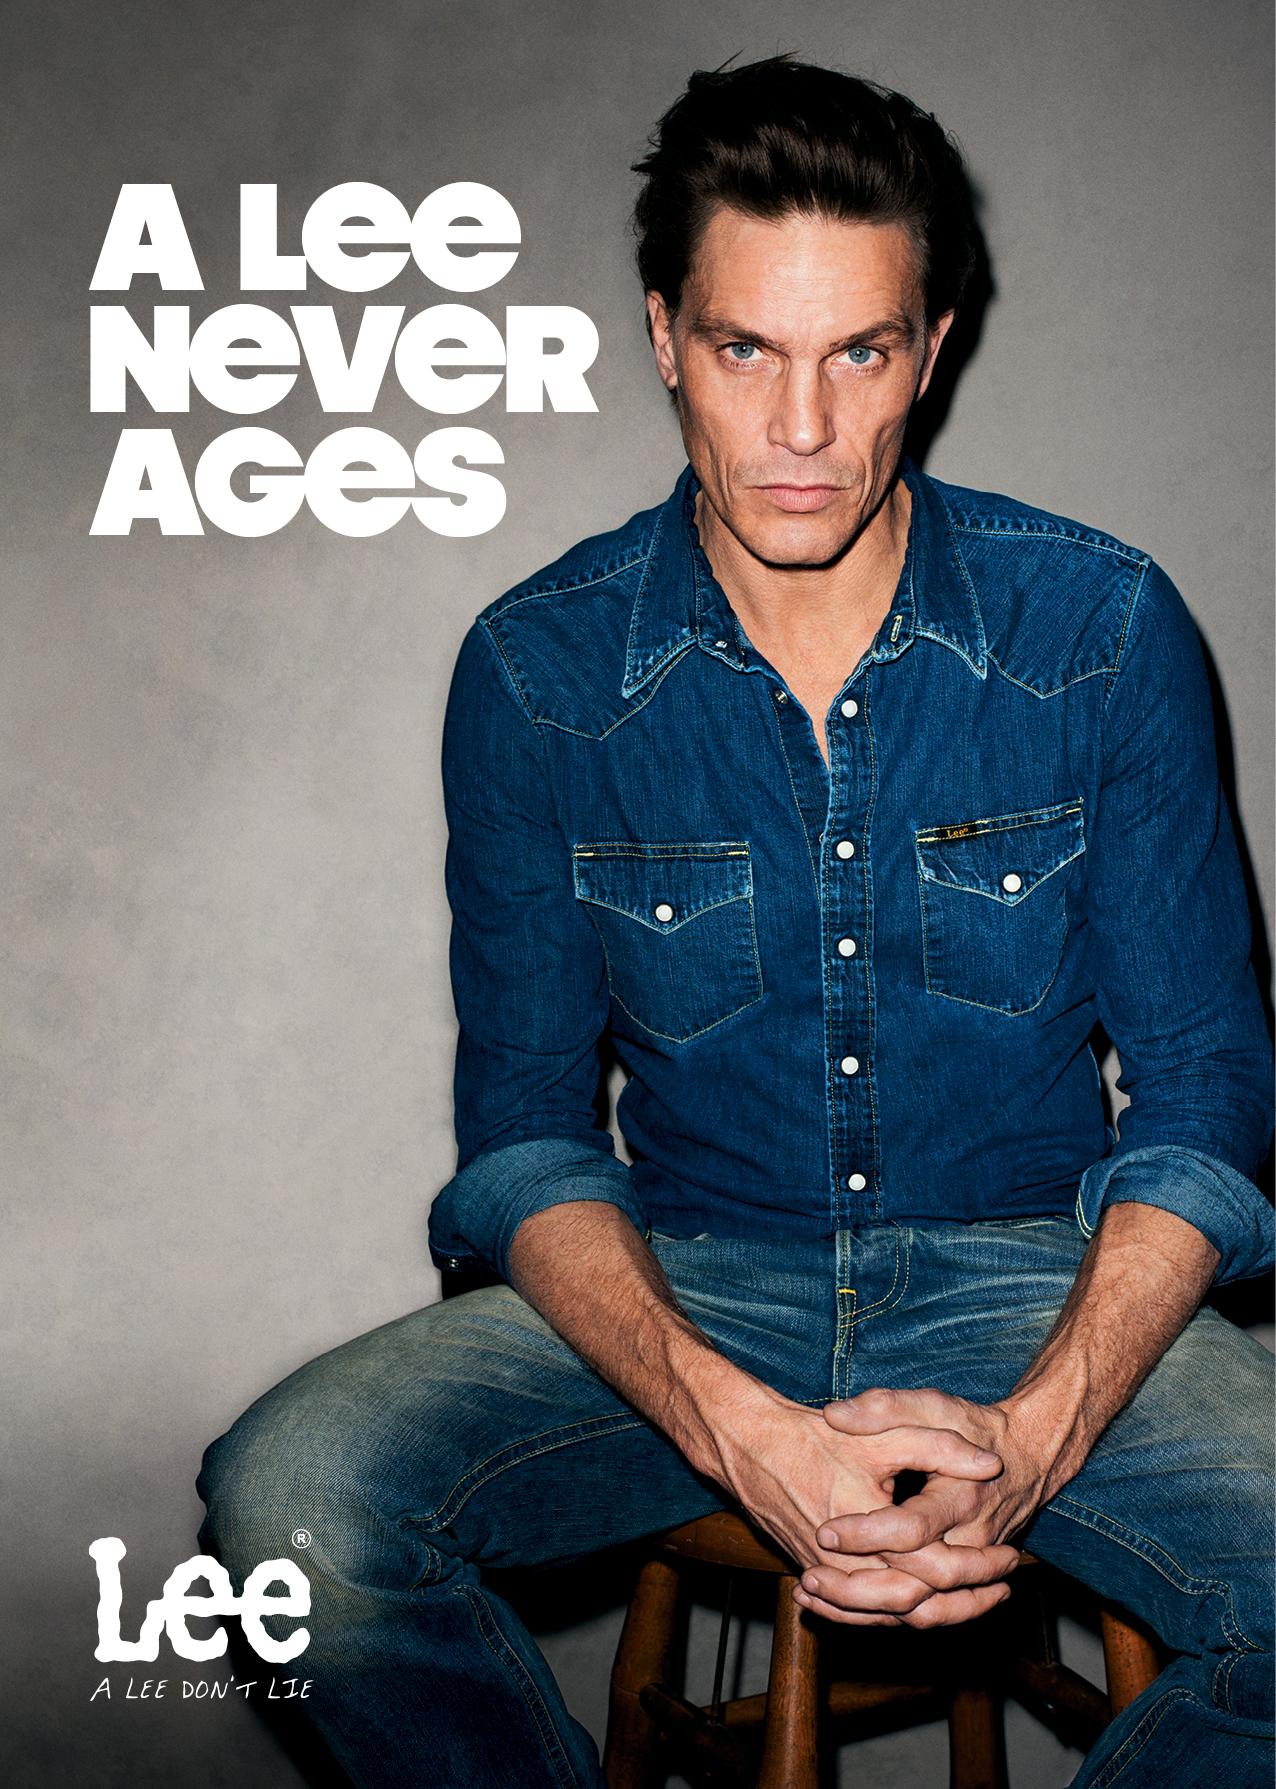 A Lee Never agees lautet der Slogan der Lee Jeans Werbekampagne